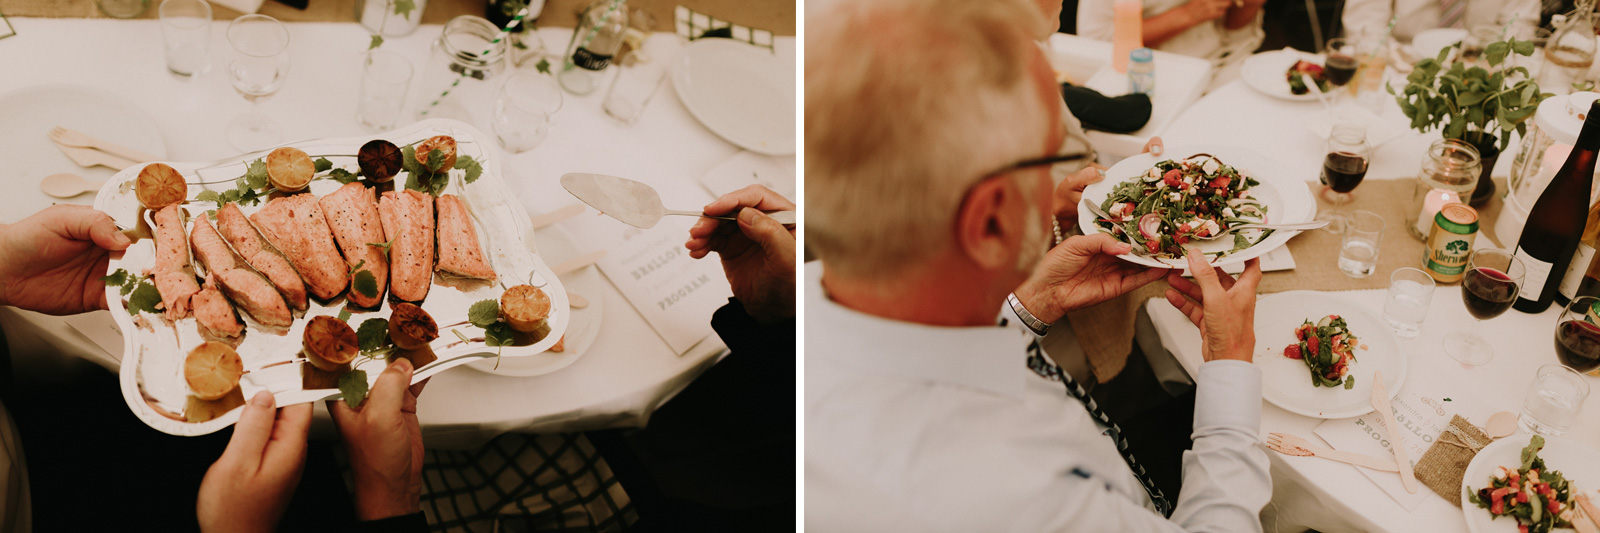 wedding-food-sweden